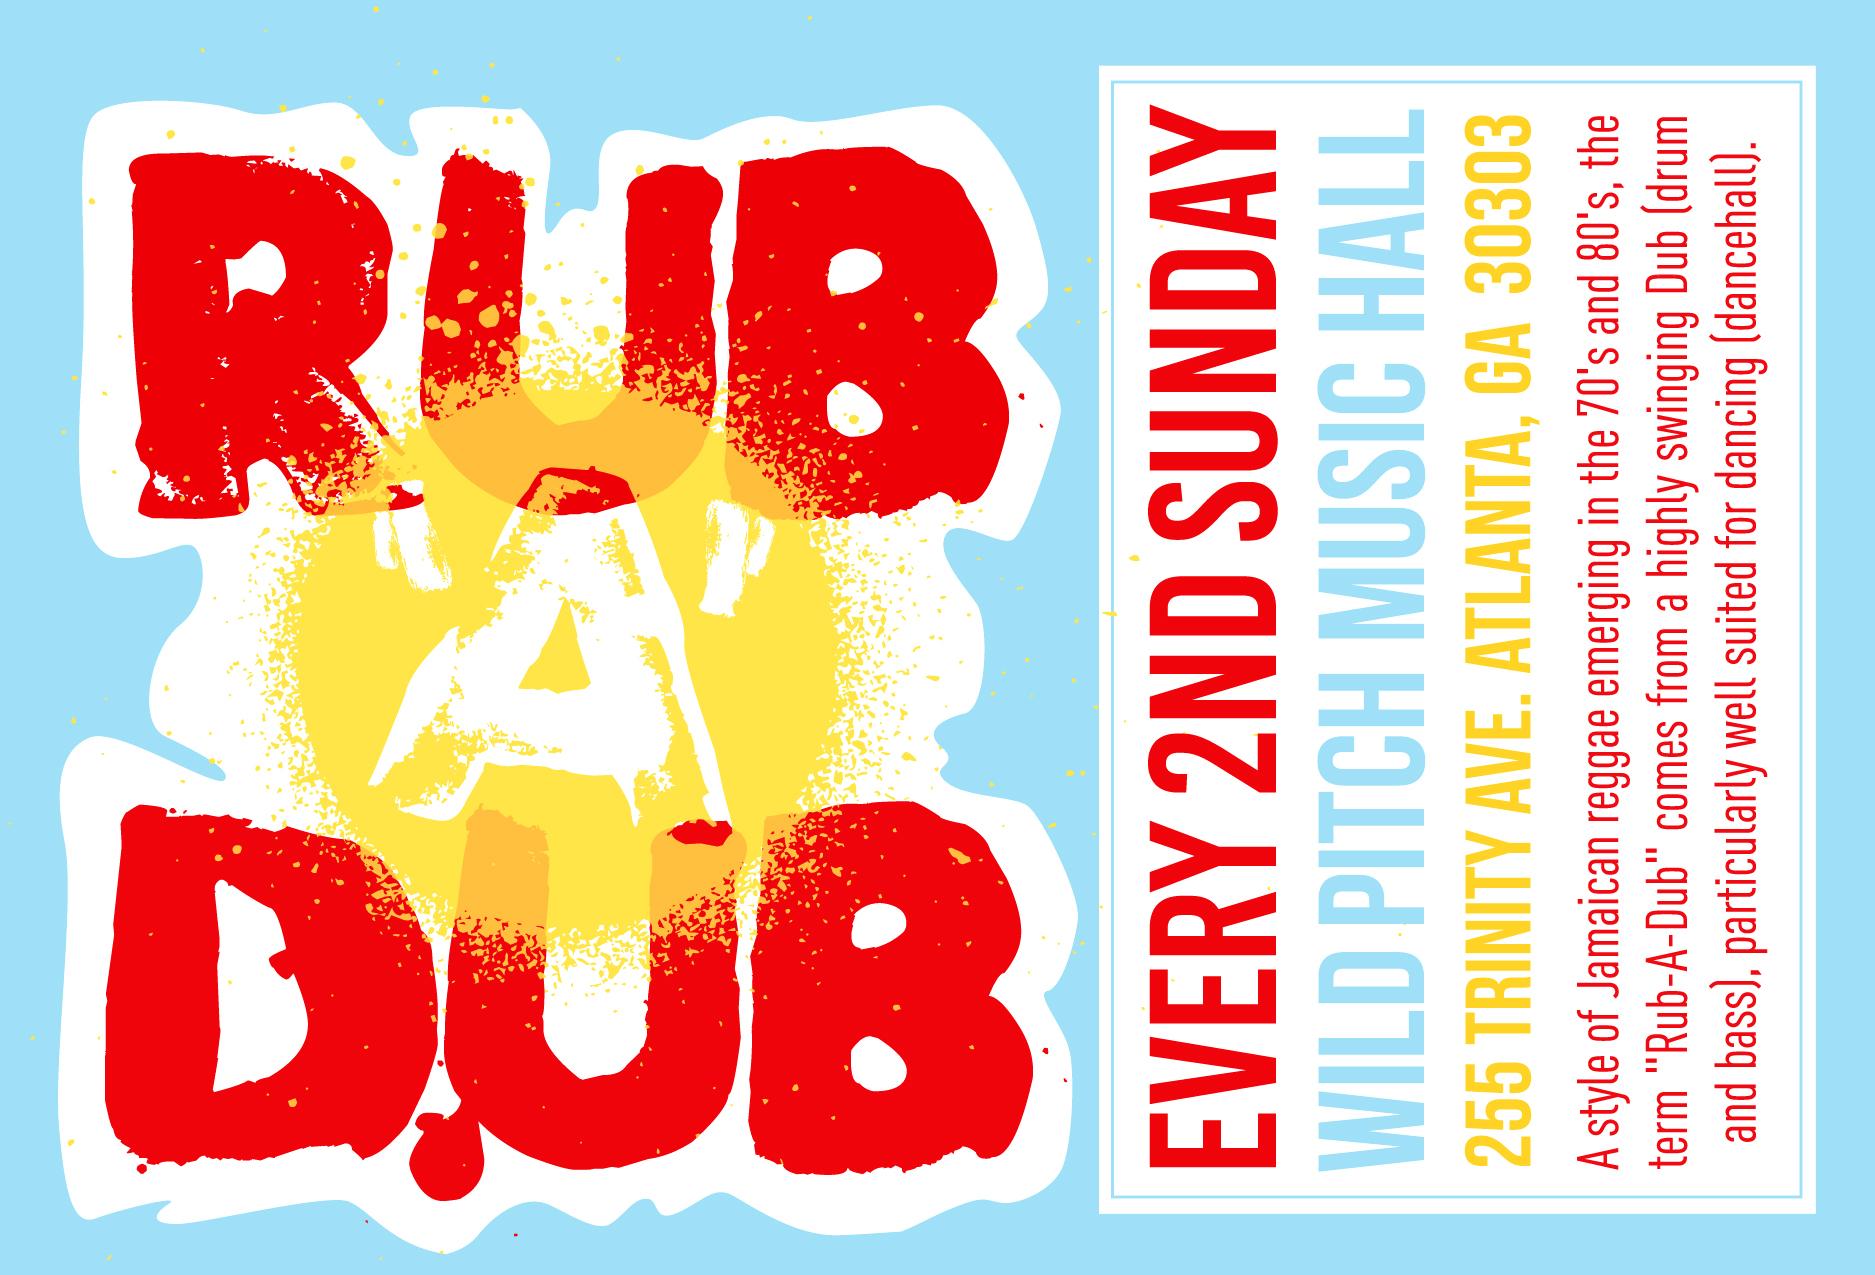 #rubadubatl poster